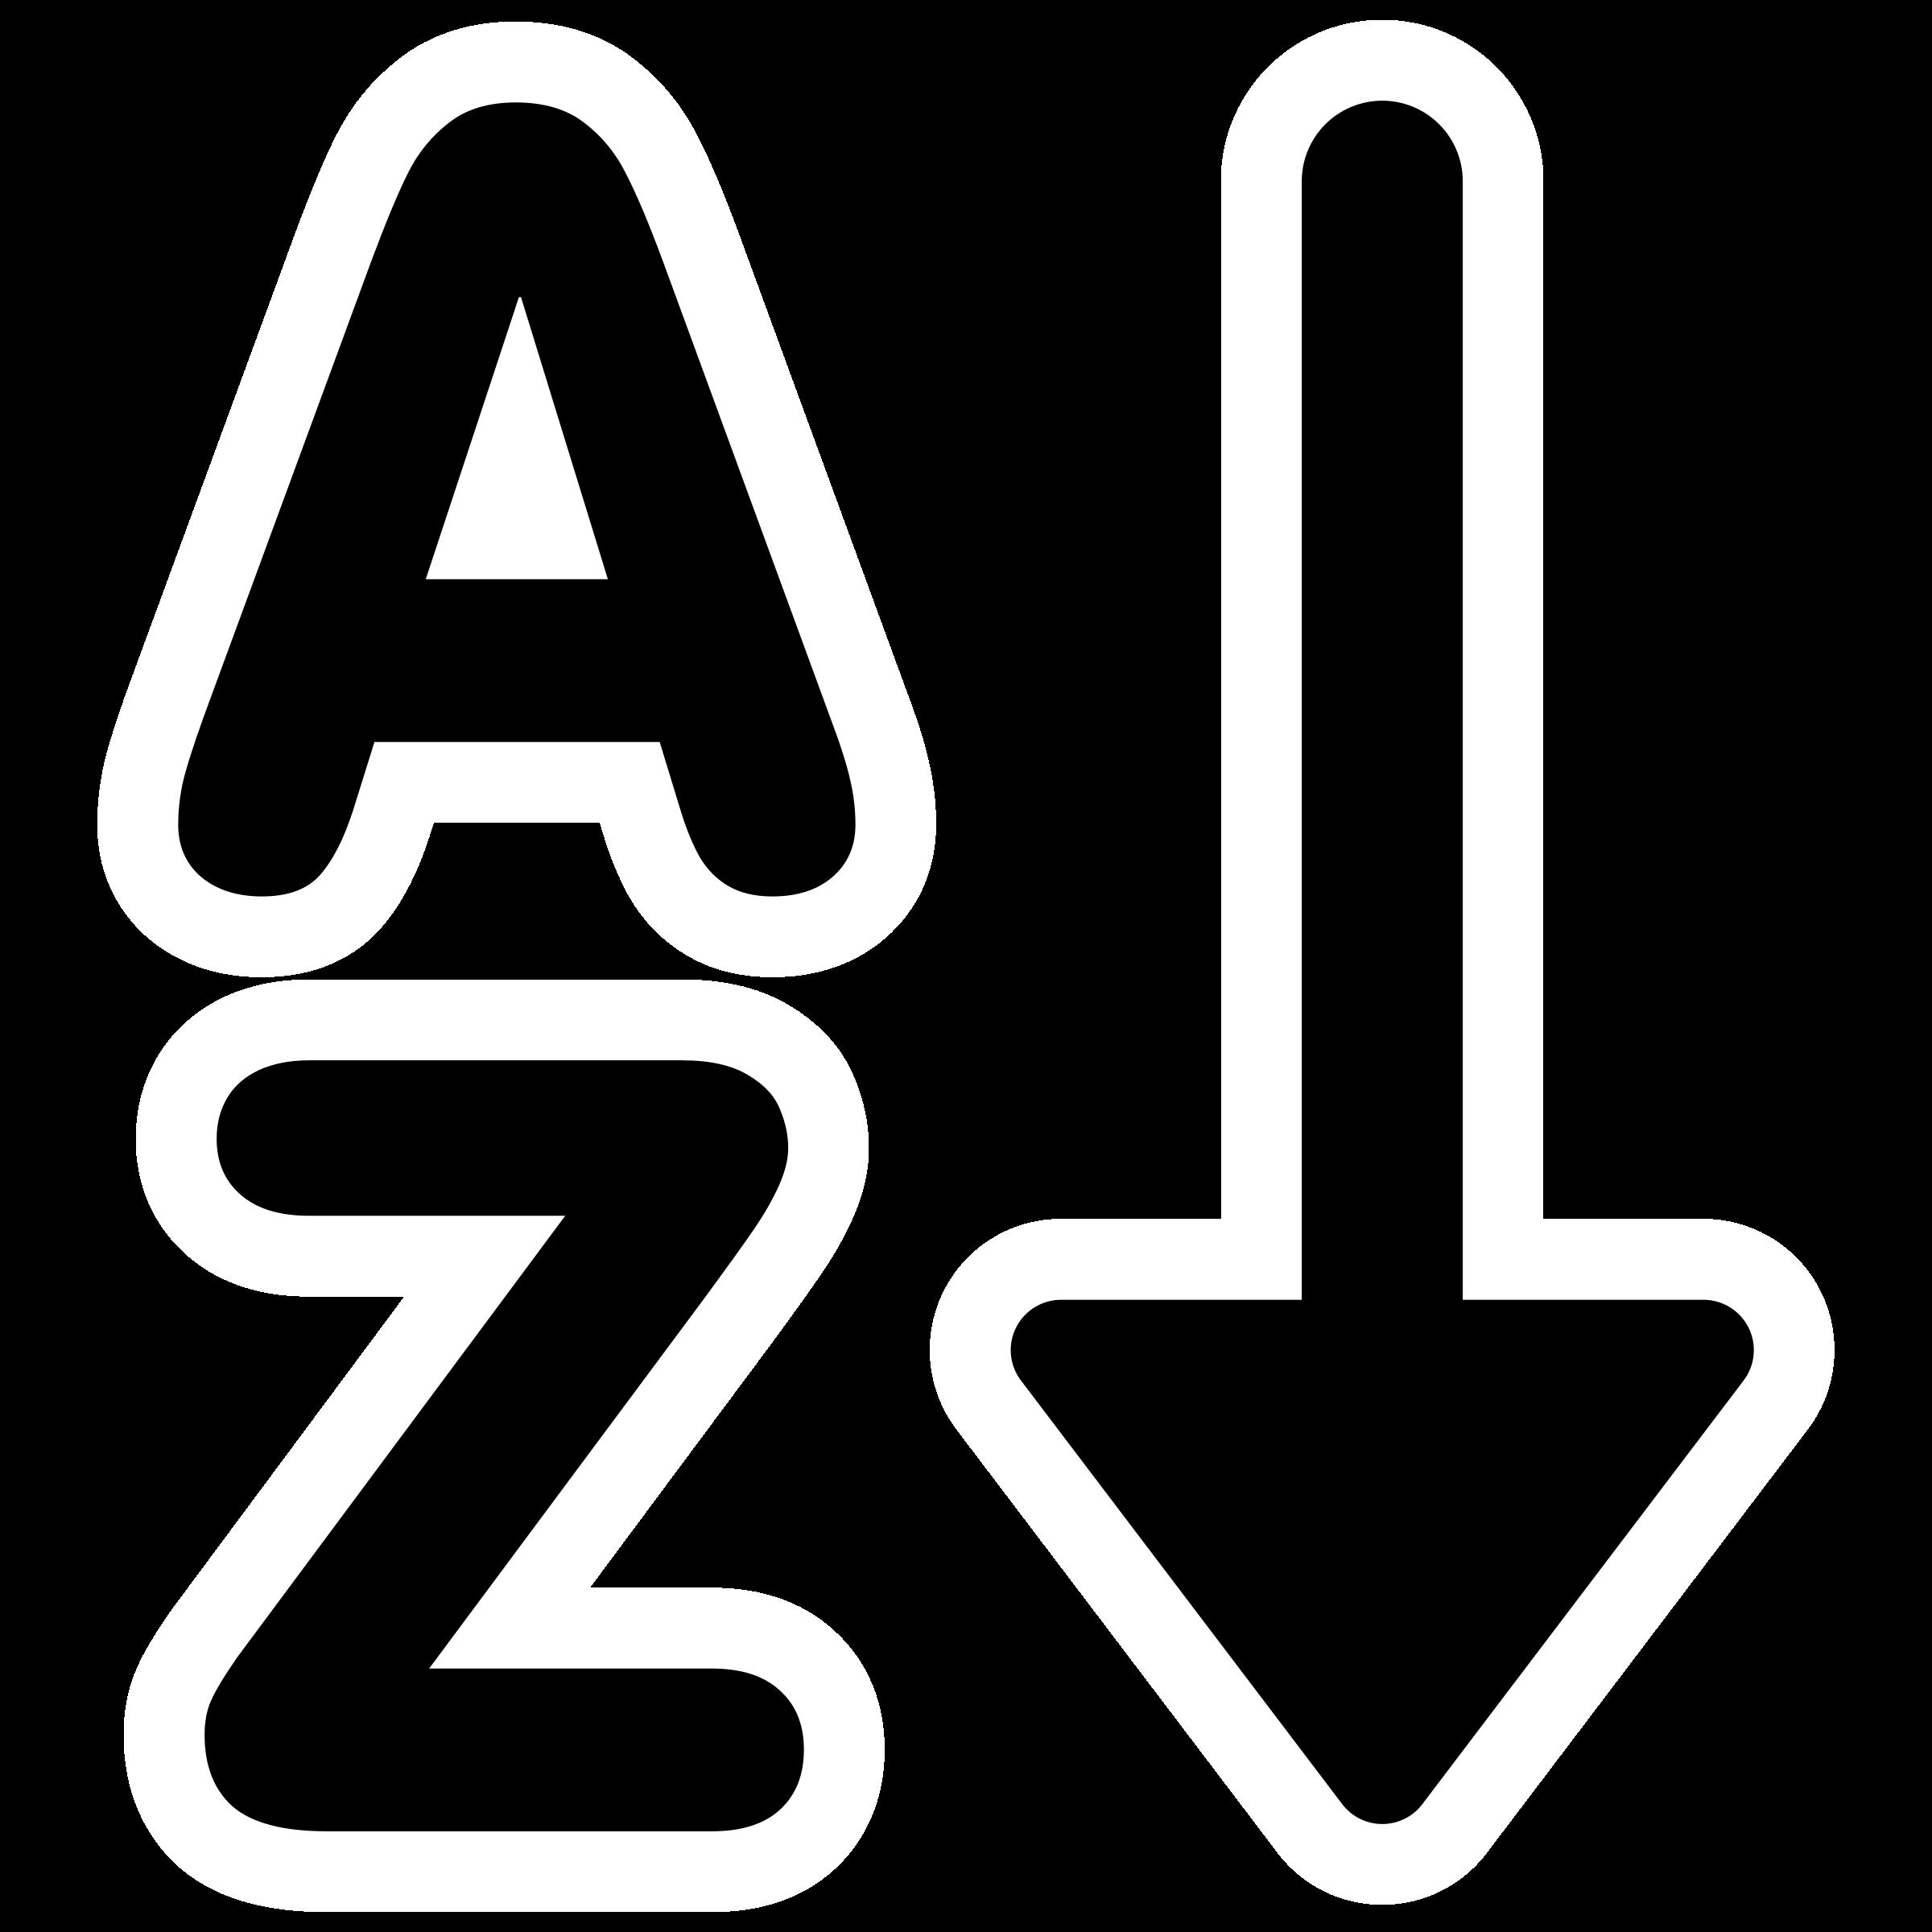 2400x2400 Black And White Arizona Clipart